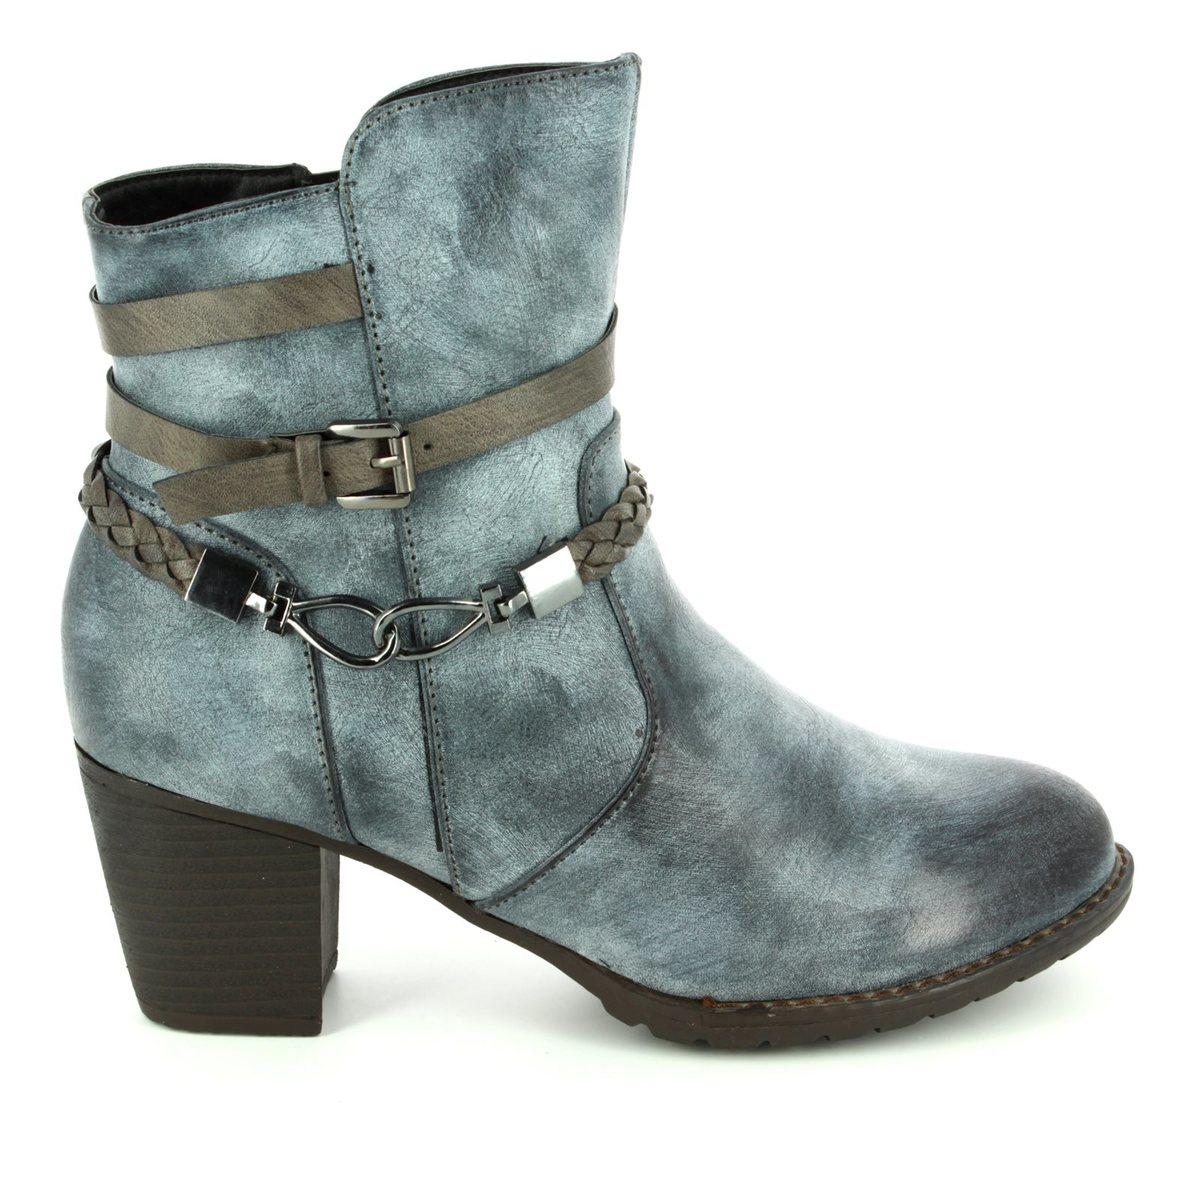 633b2f37d50e7 Begg Shoes Ankle Boots - Blue - 225355/41 SARAST